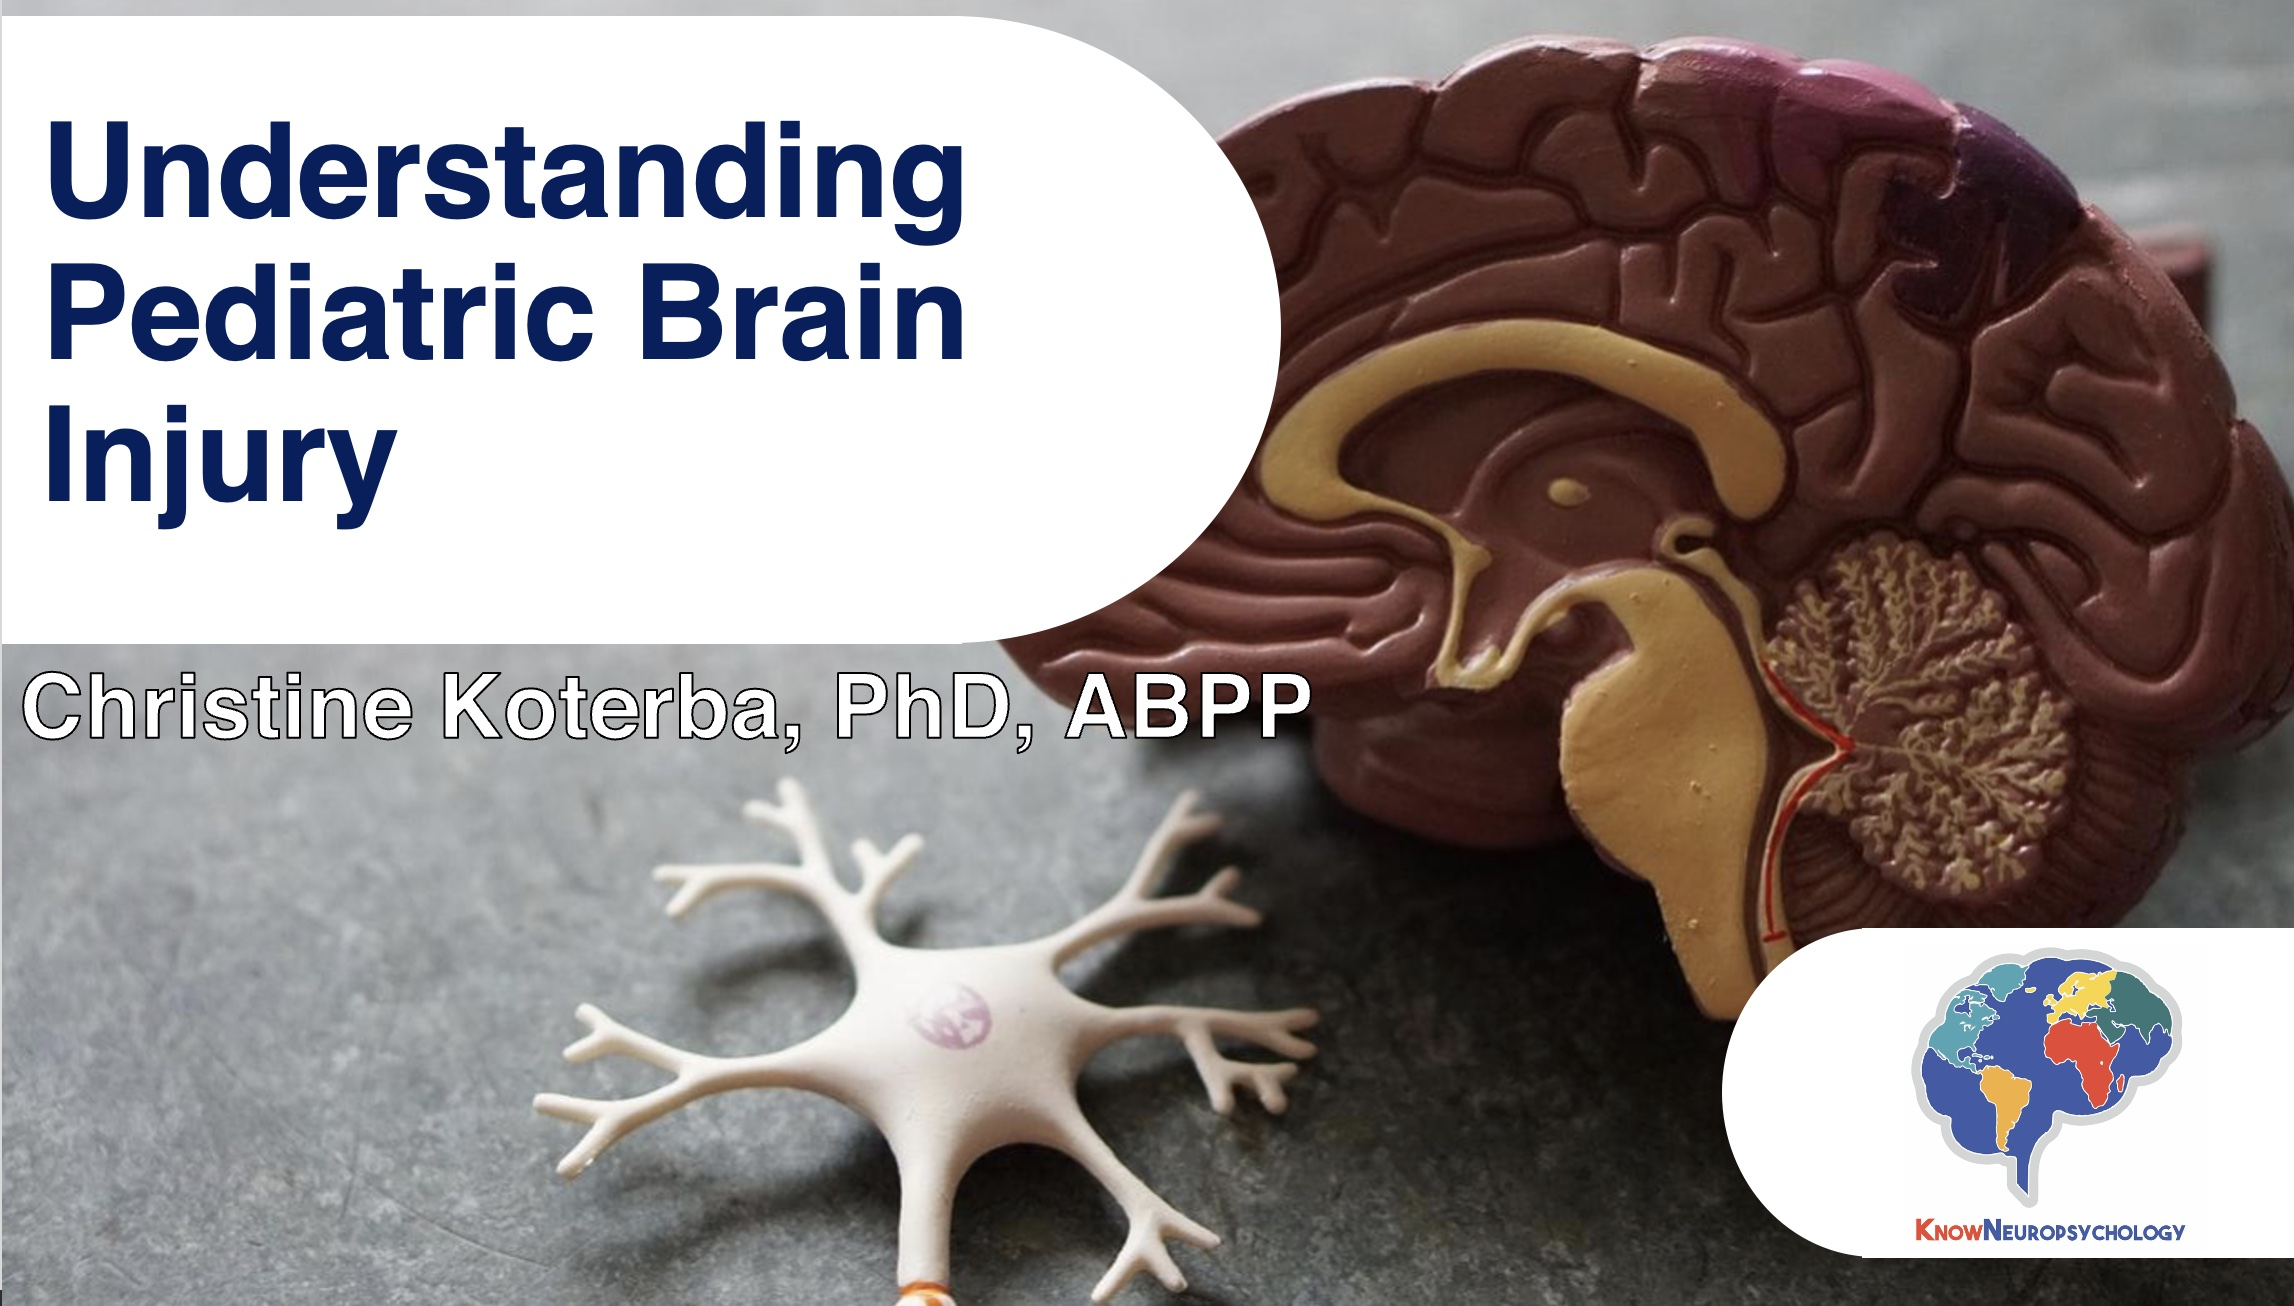 Understanding Pediatric Brain Injury with Dr. Christine Koterba